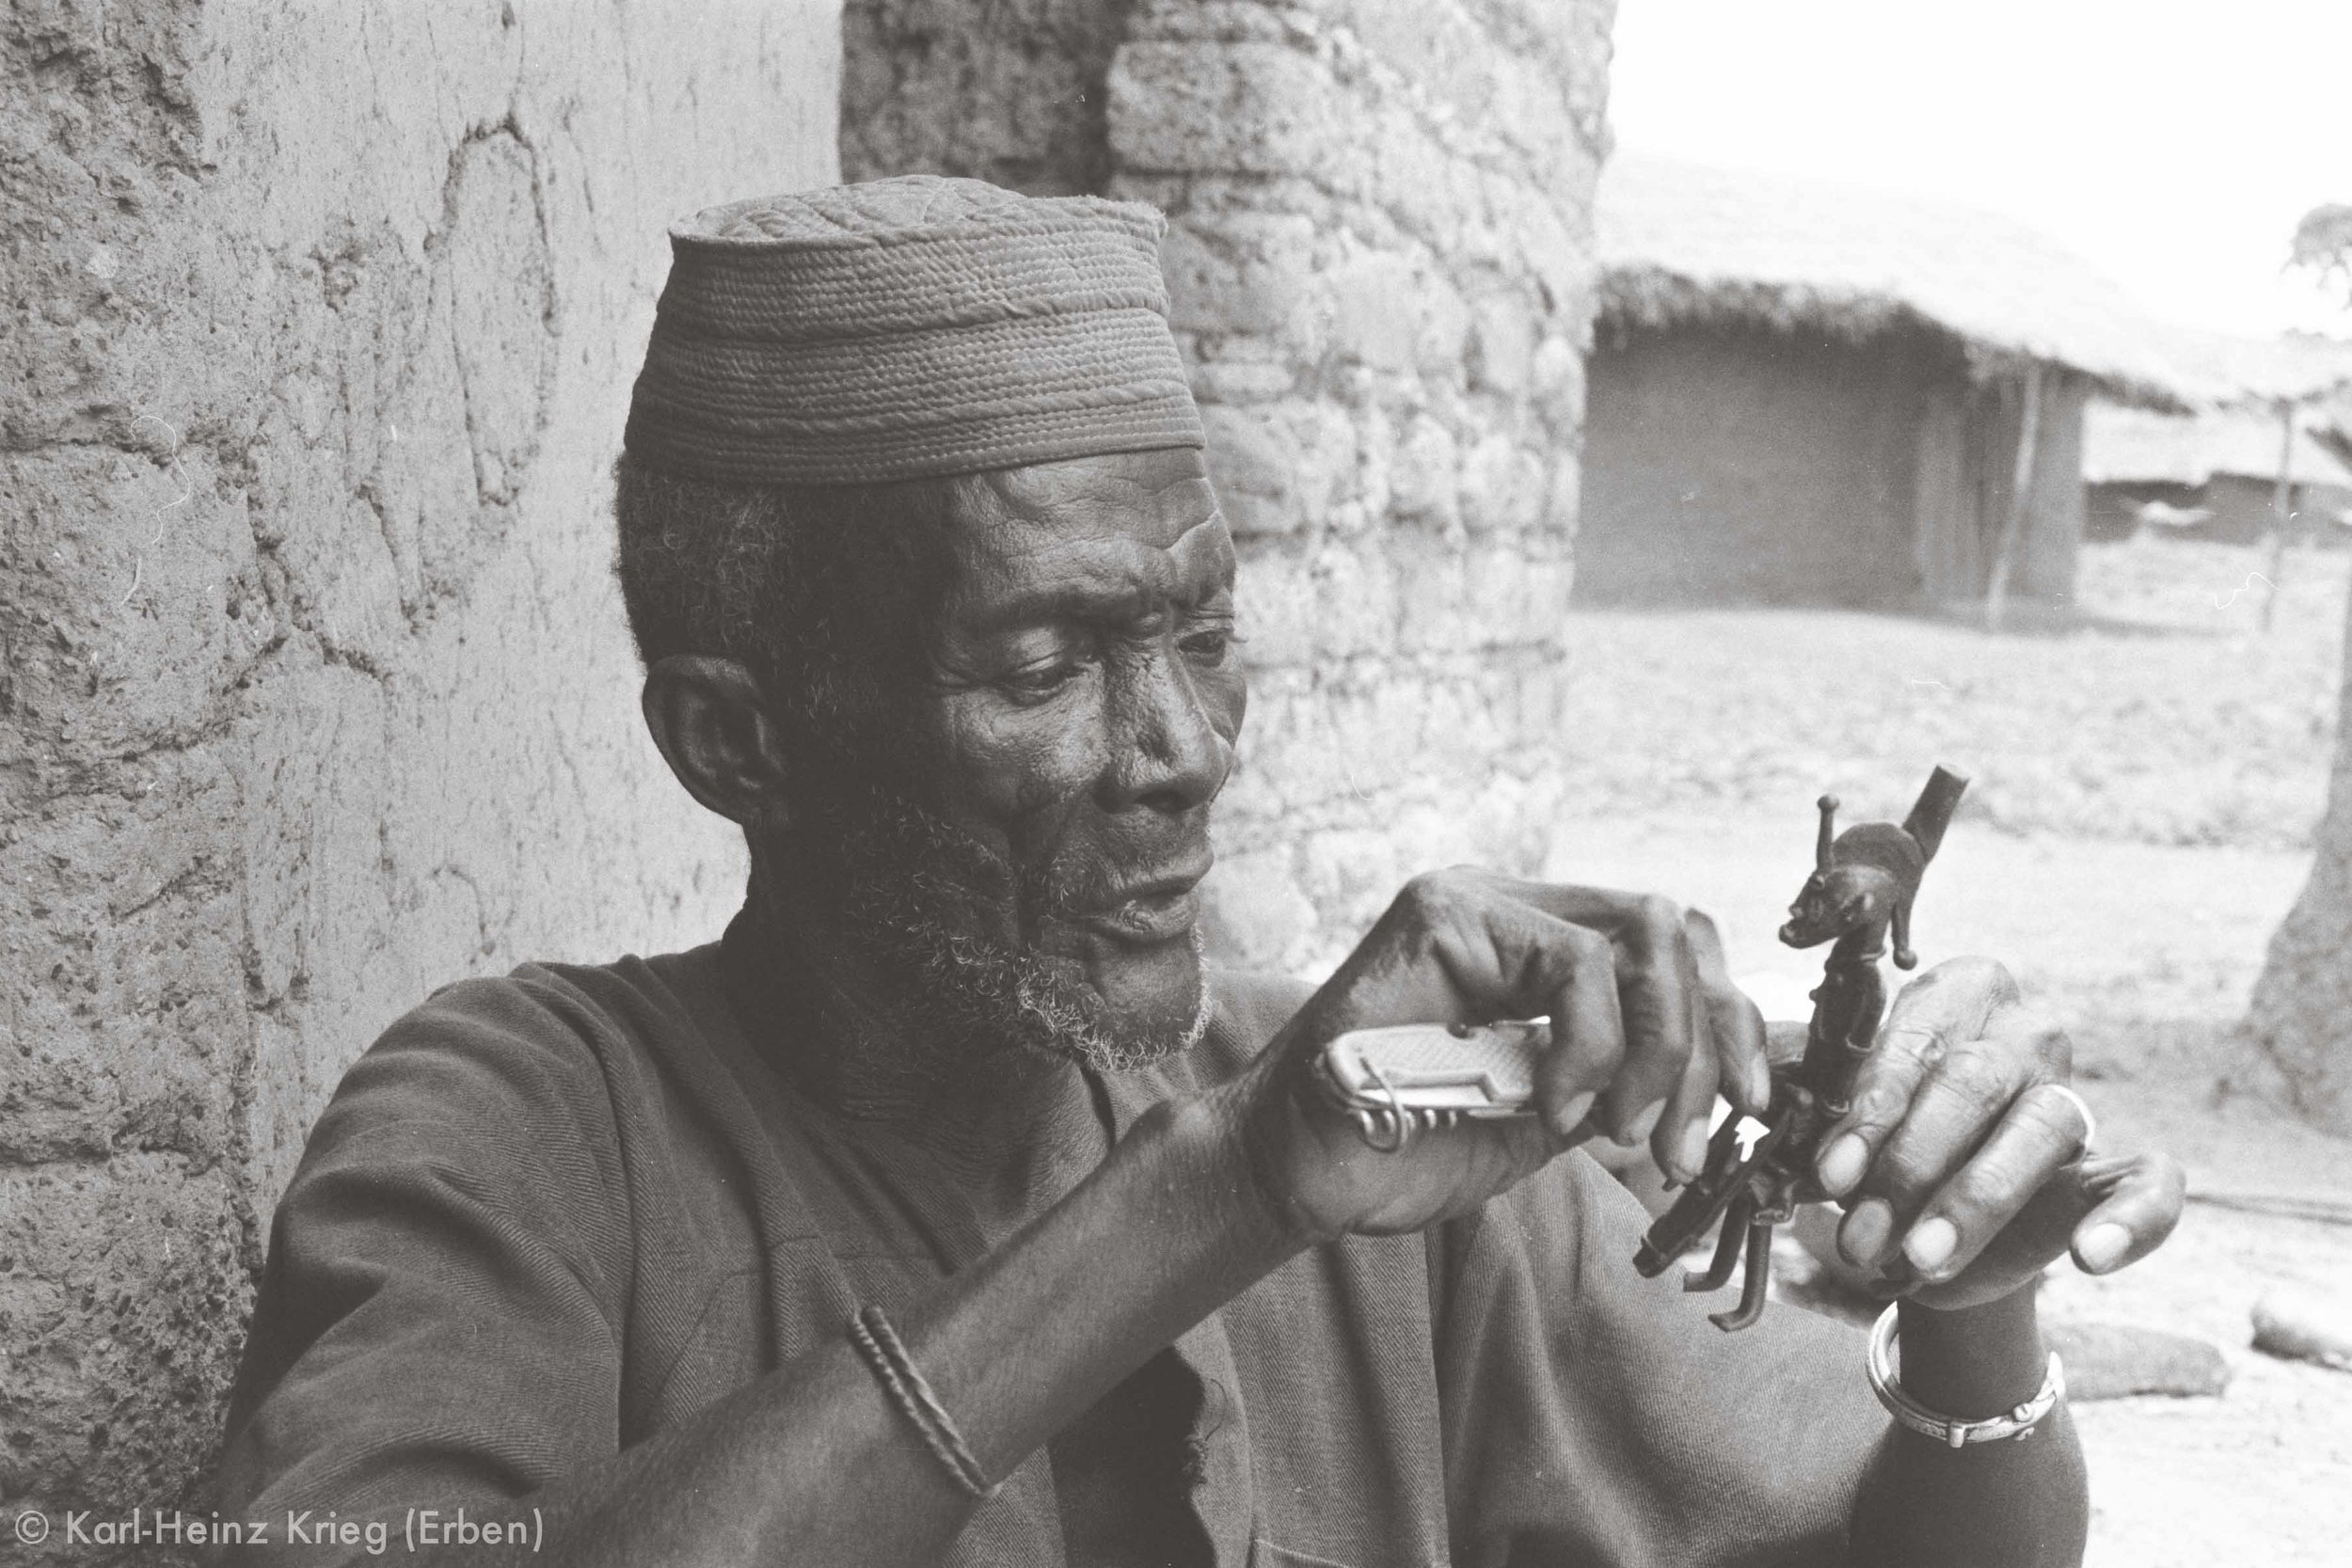 Kolo Silué making a wax model of an equestrian figure. Photo: Karl-Heinz Krieg, Nafoun (Region of Boundiali, Côte d'Ivoire), 1975